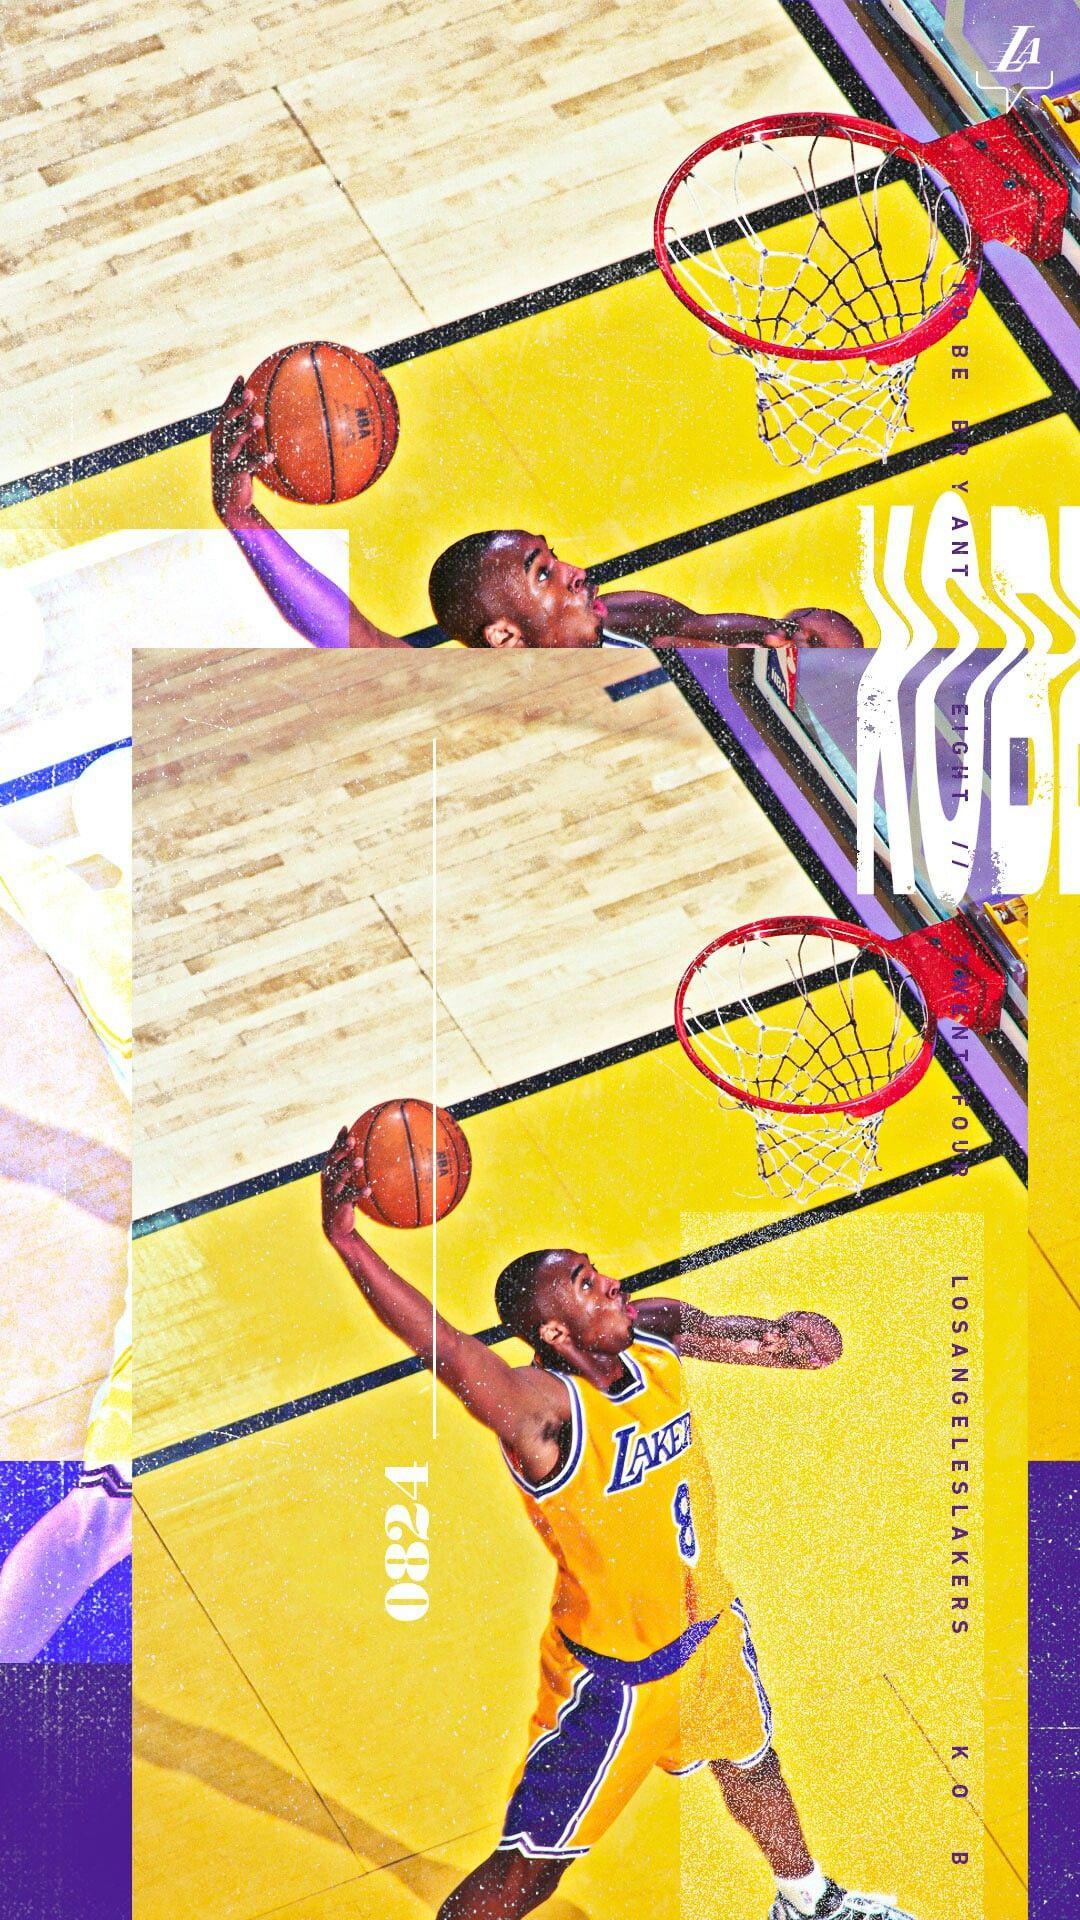 Pin By Qam Yasharahla On Kobe Lal Lakers Wallpaper Nba Basketball Art Kobe Bryant Nba